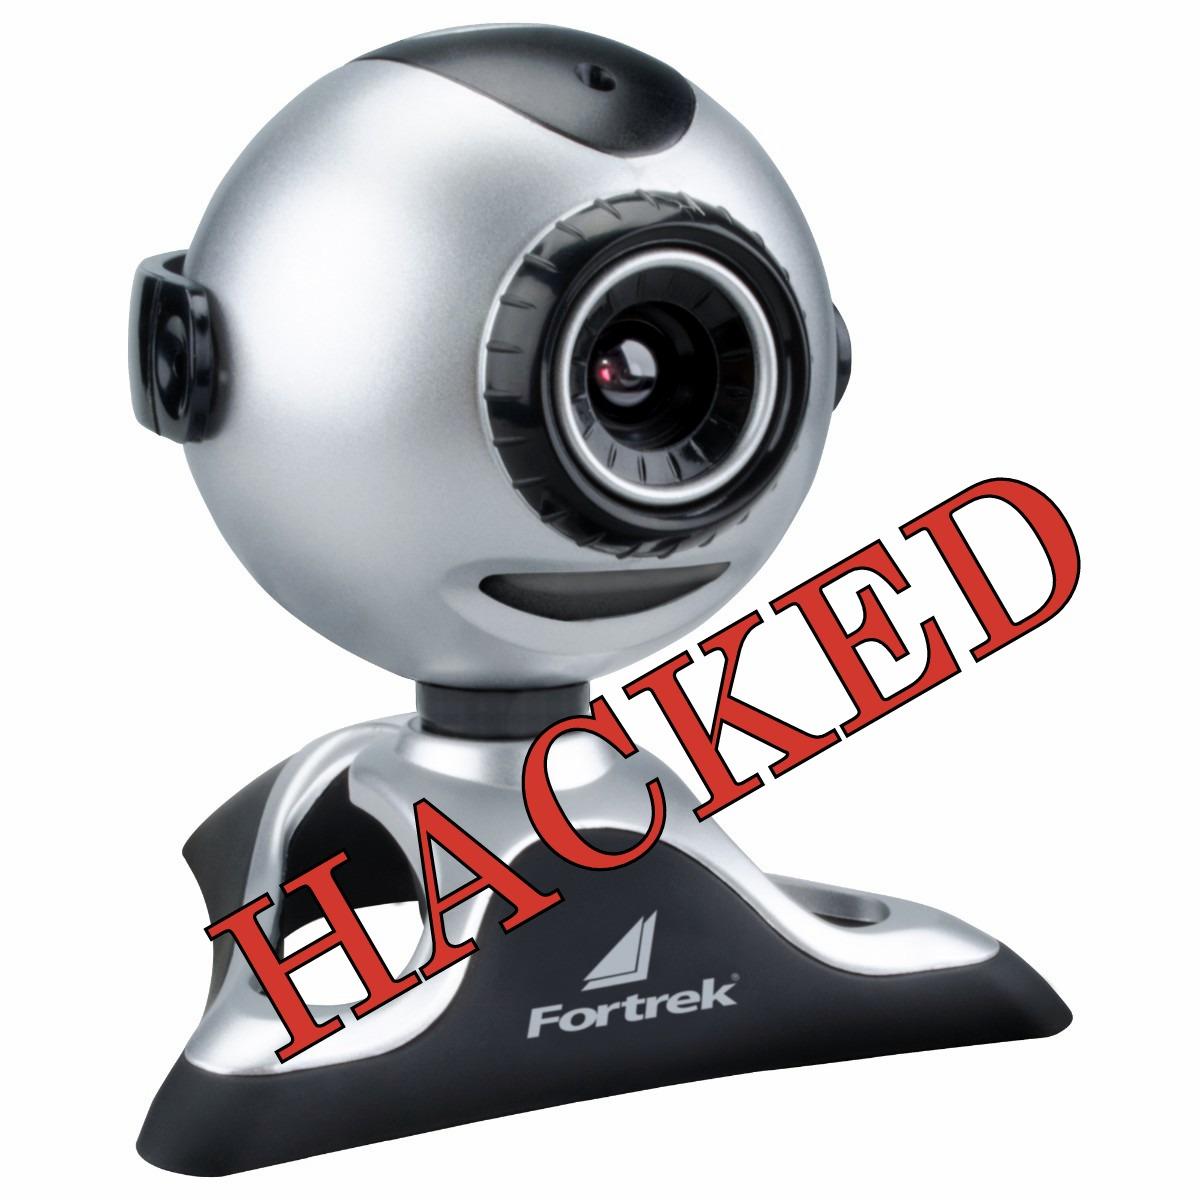 Tech Tricks and Hacks: How to hack CCTV cameras and webcams